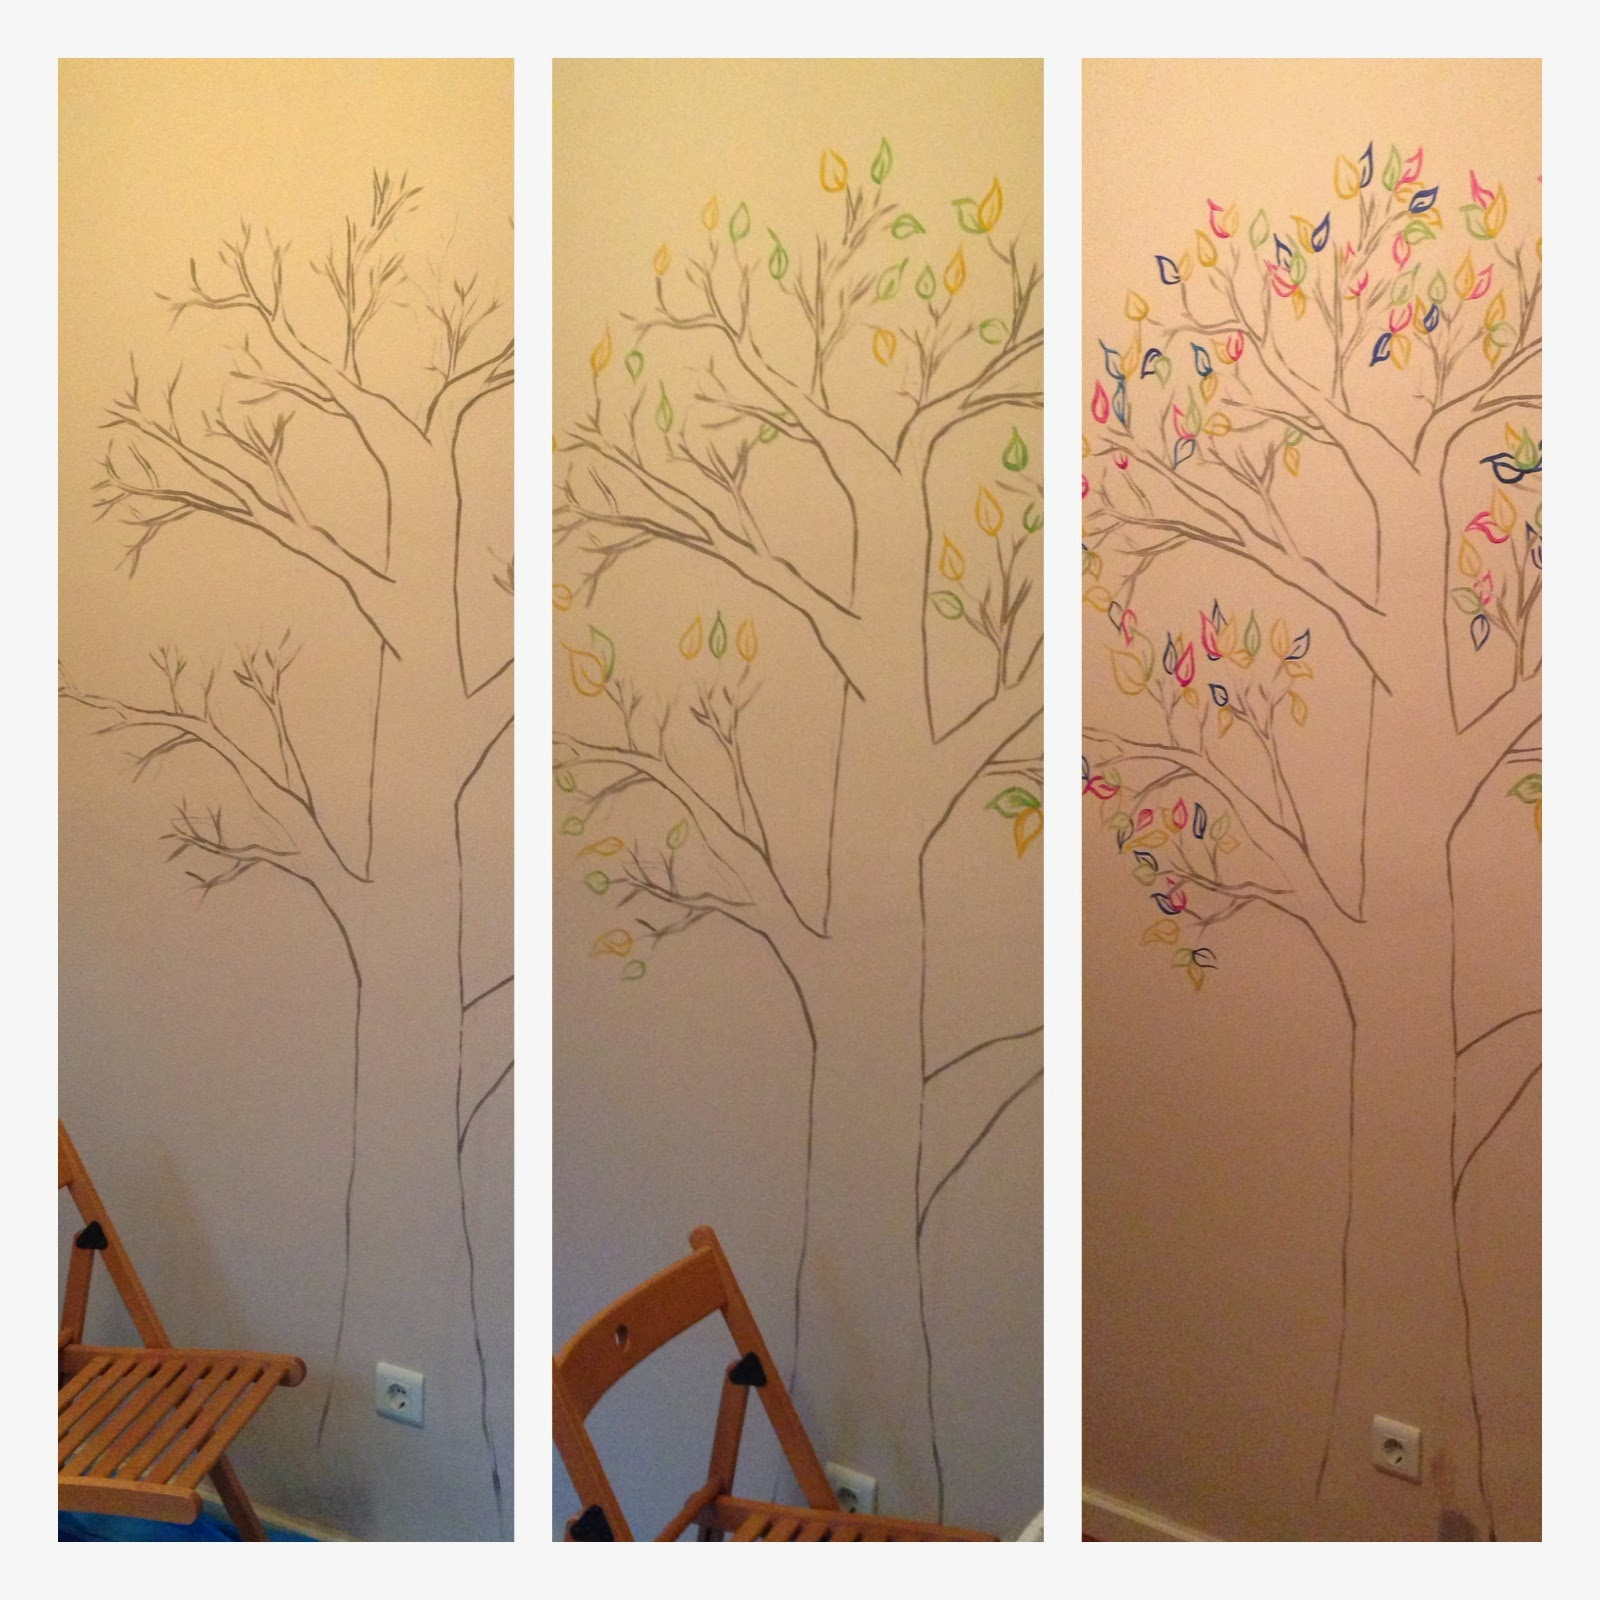 Mural para martina rbol de colores rojosill n for Papel de pared para pintar